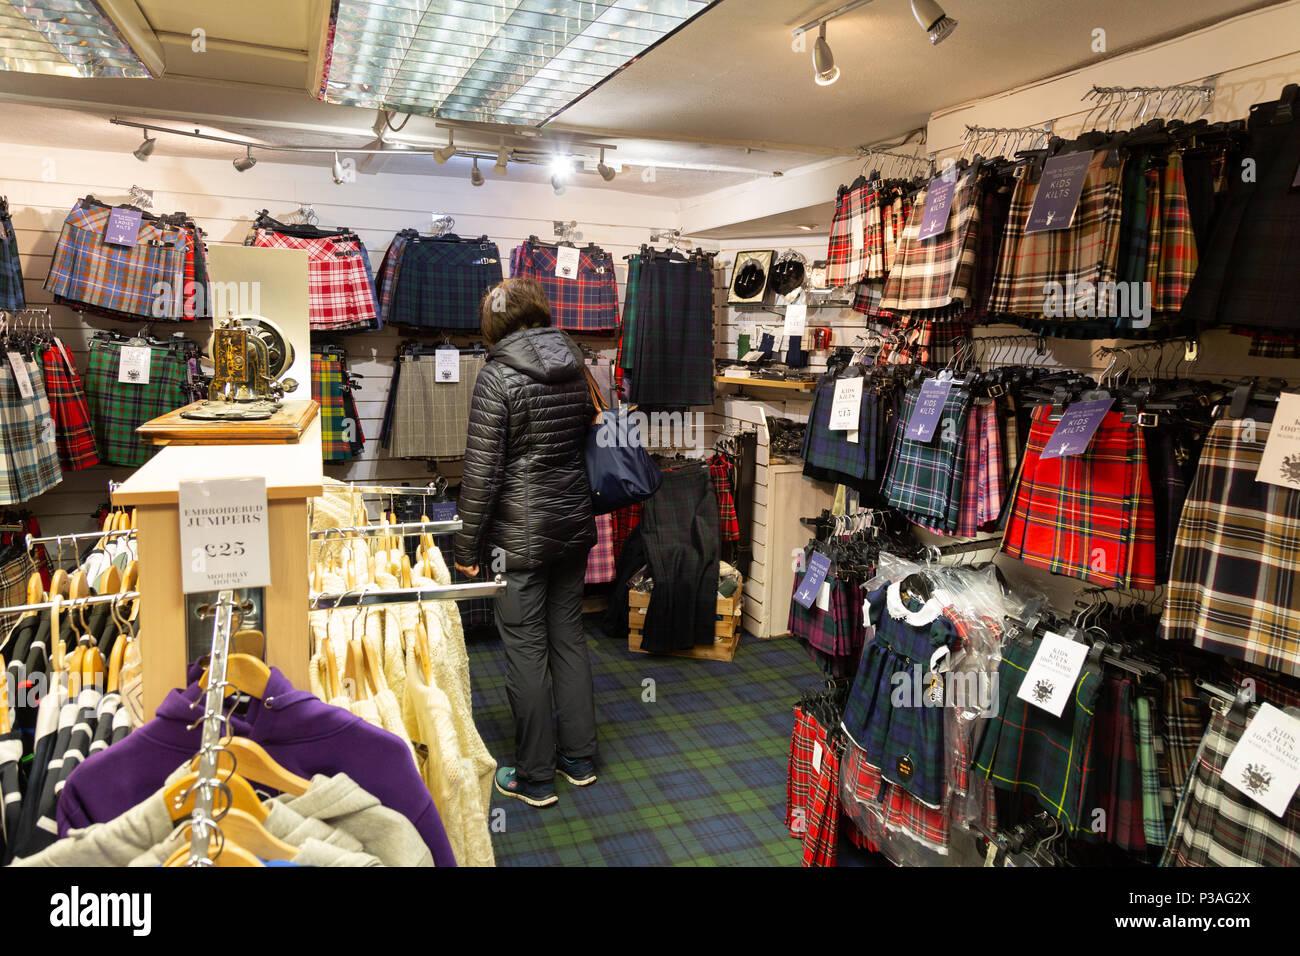 A woman shopping for kilts , in a kilt shop, Edinburgh, Scotland UK - Stock Image